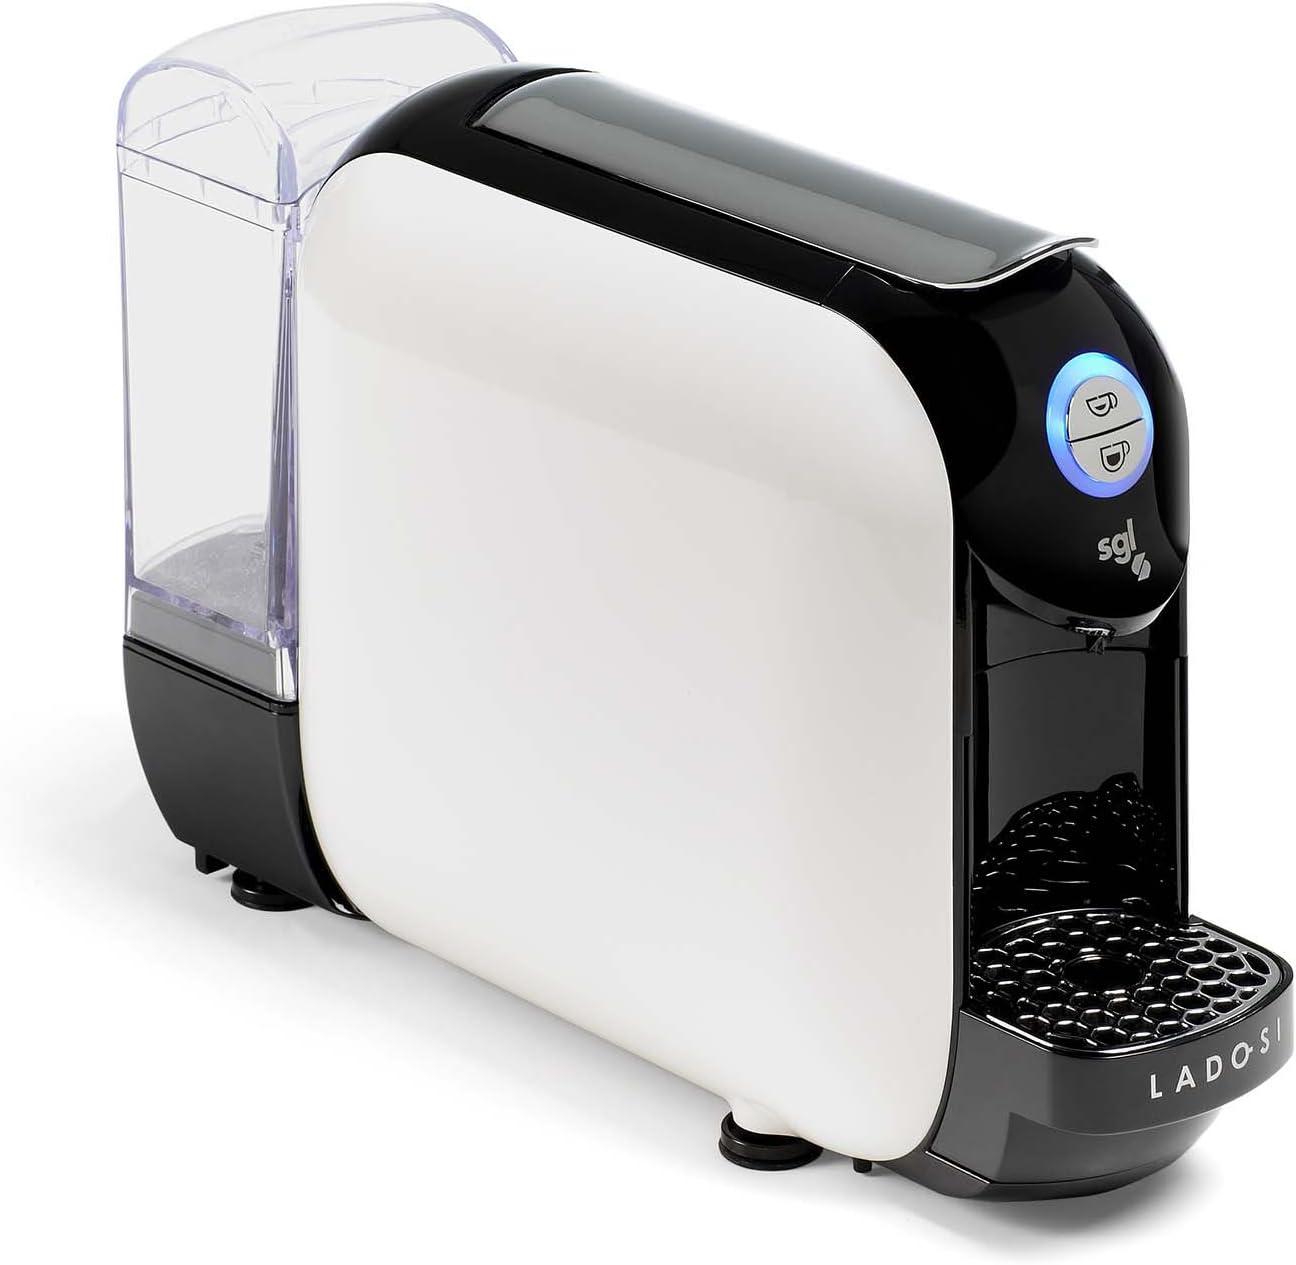 Máquina de Cápsulas Café Flexy Compatibles FAP/EP: Amazon.es: Hogar